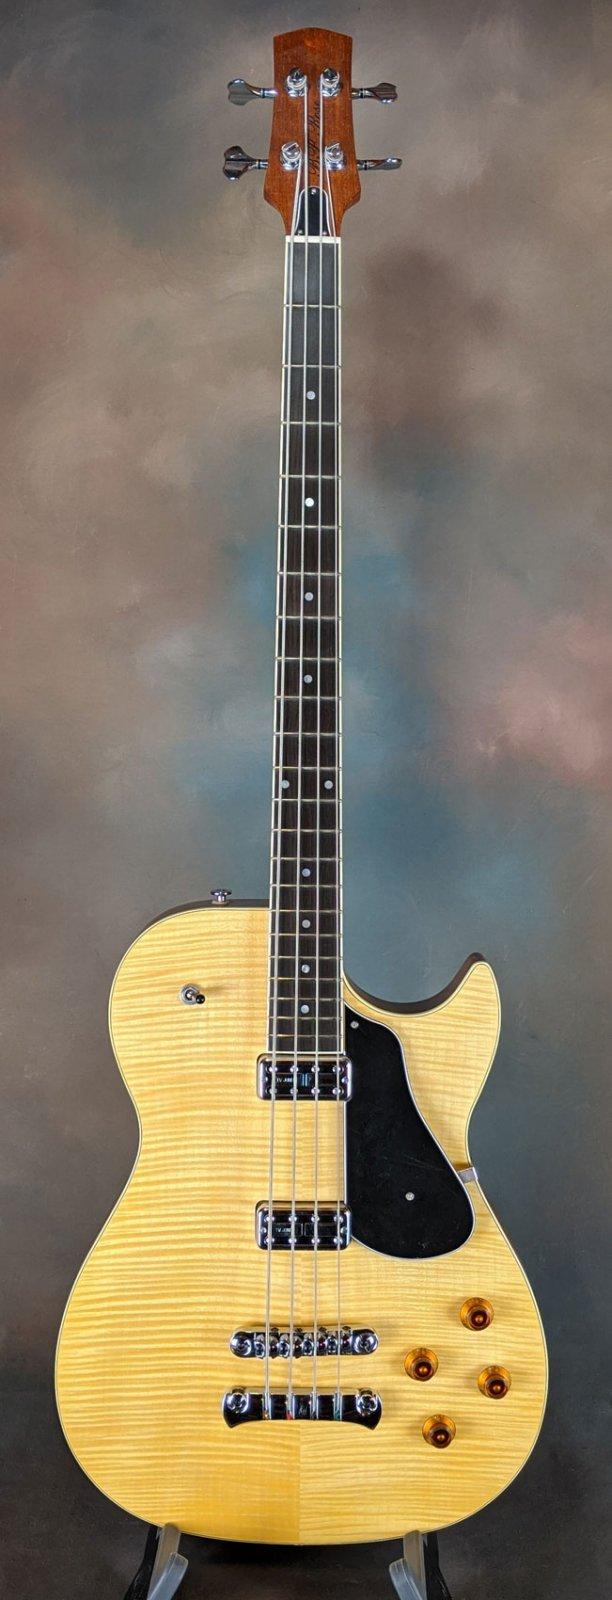 BP Rose BTF150 Semi-Hollowbody Electric Bass